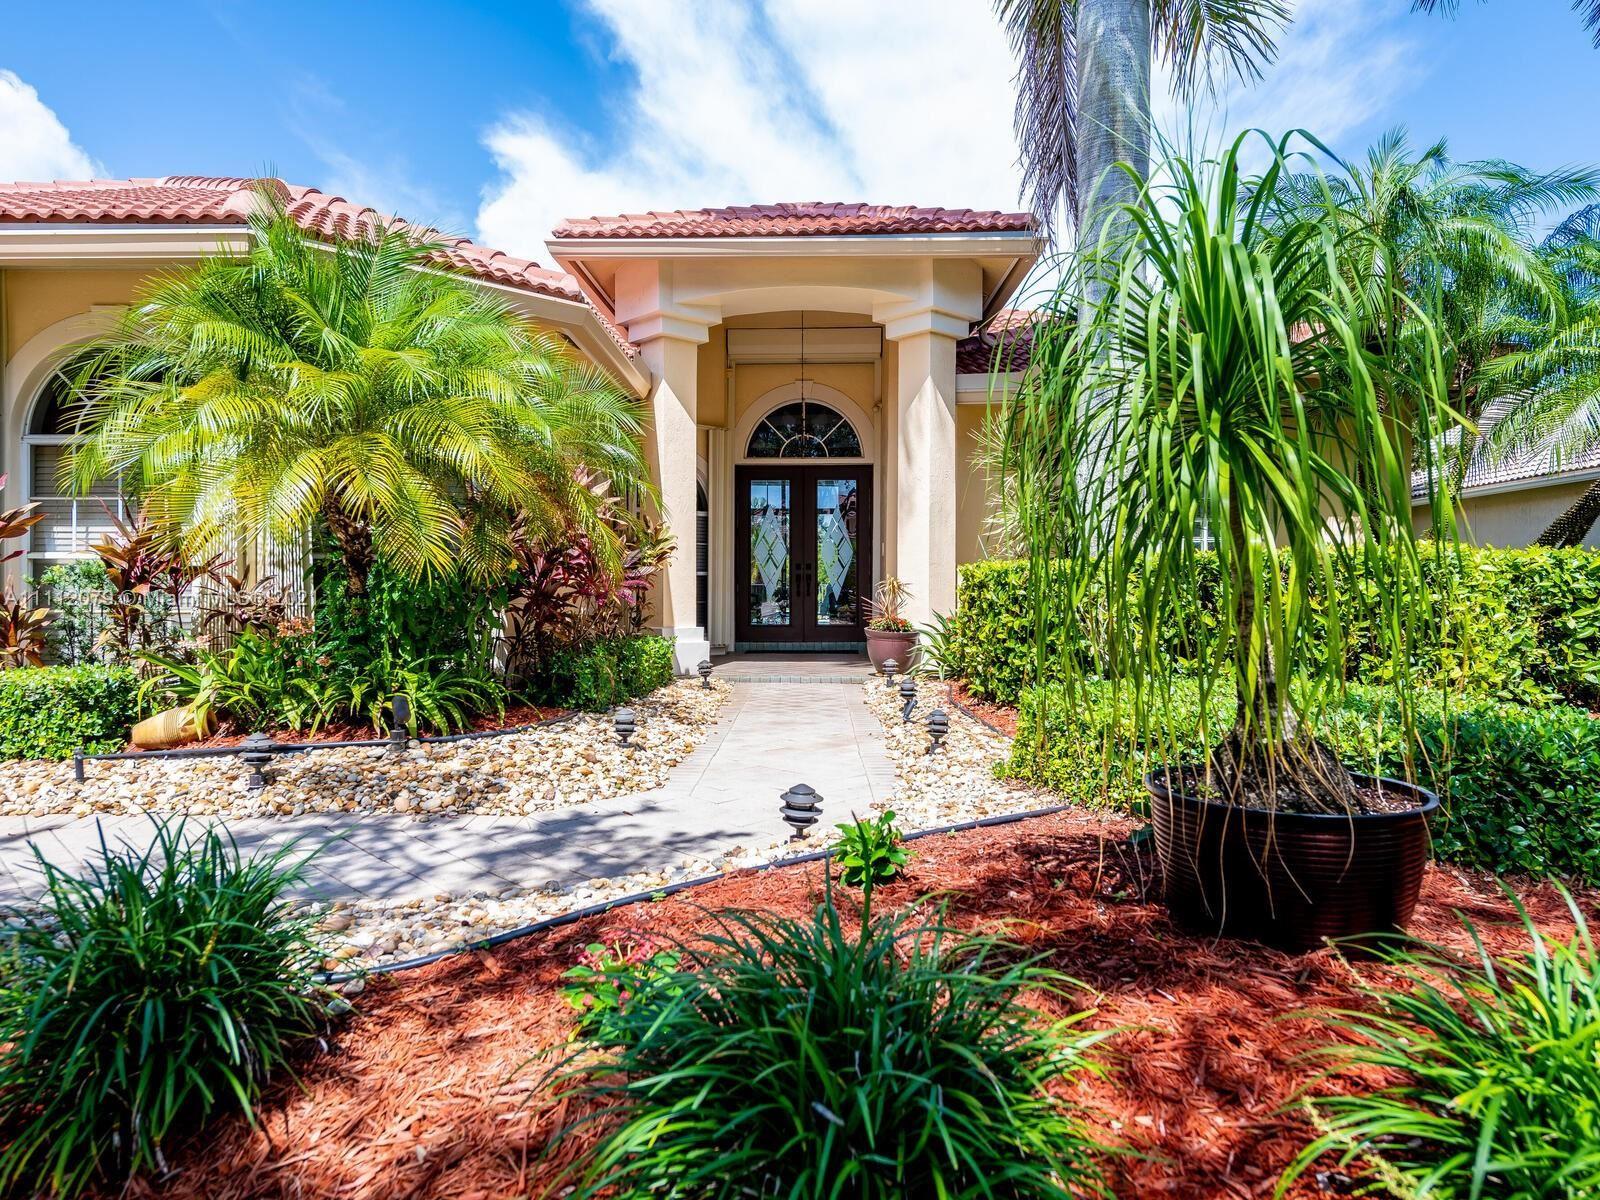 Photo of 305 Egret Ln, Weston, FL 33327 (MLS # A11112079)